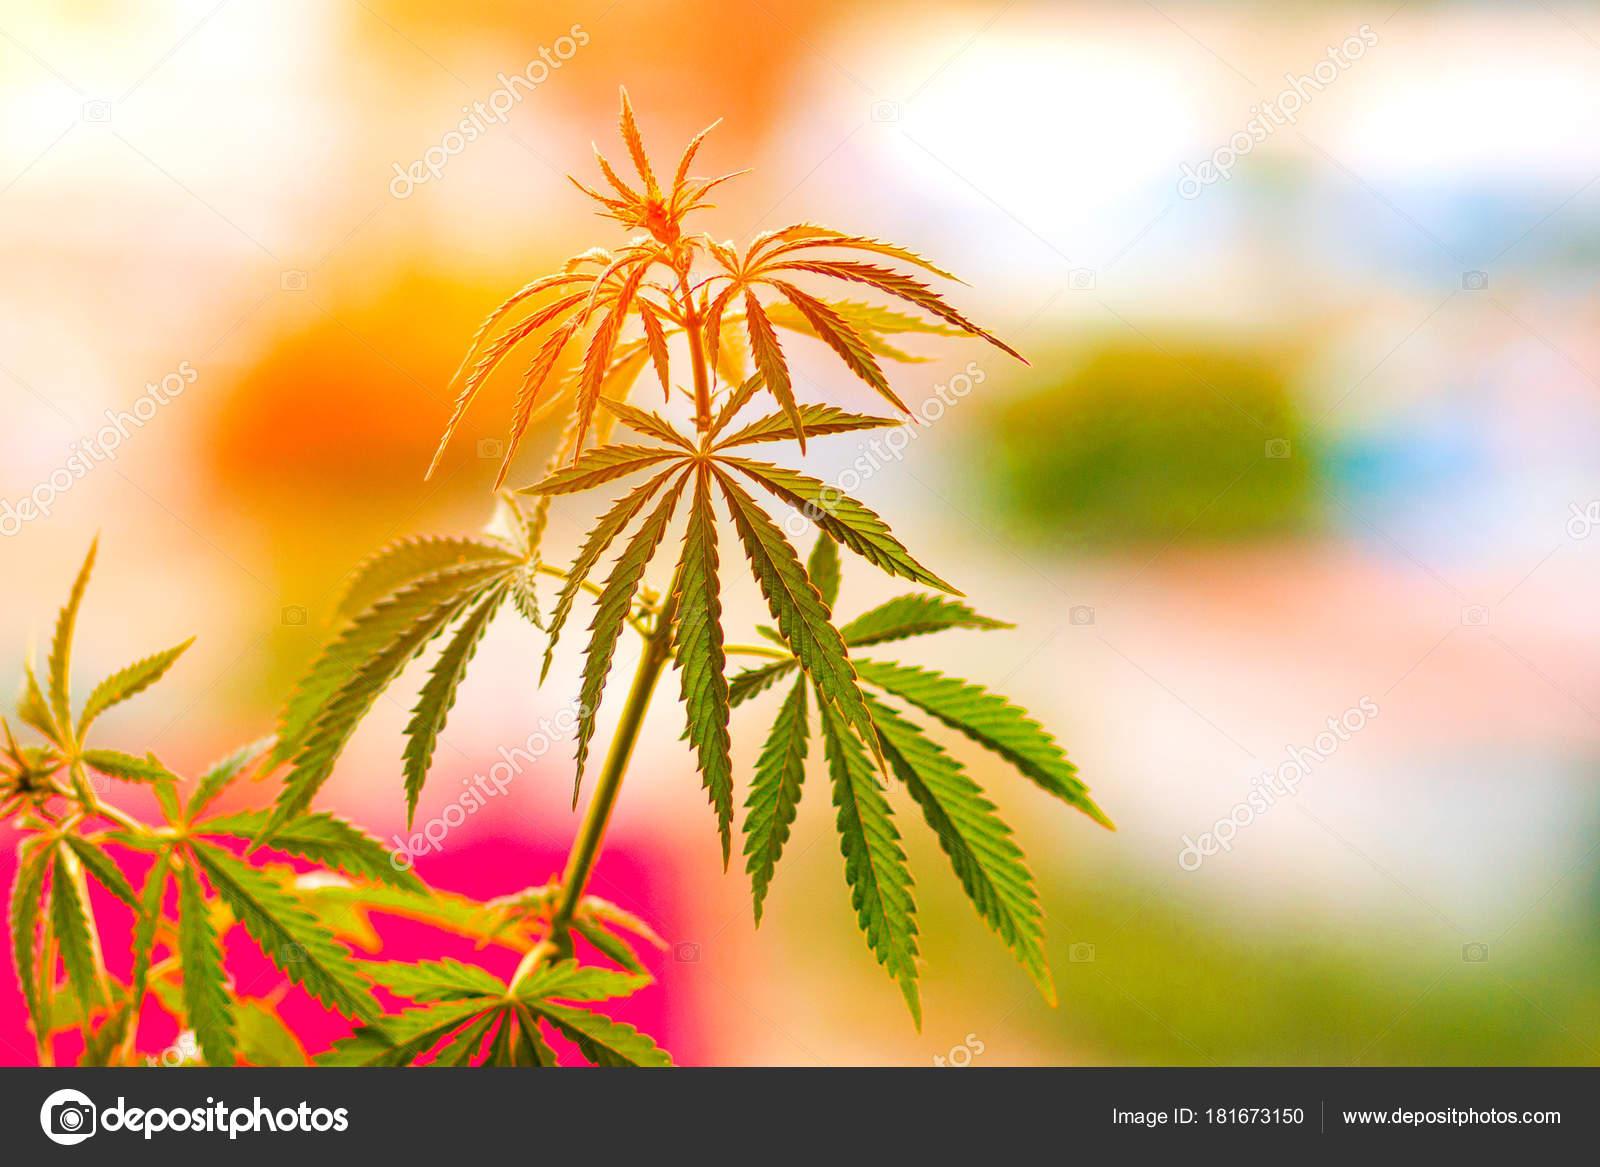 Výsledek obrázku pro marihuana a slunce